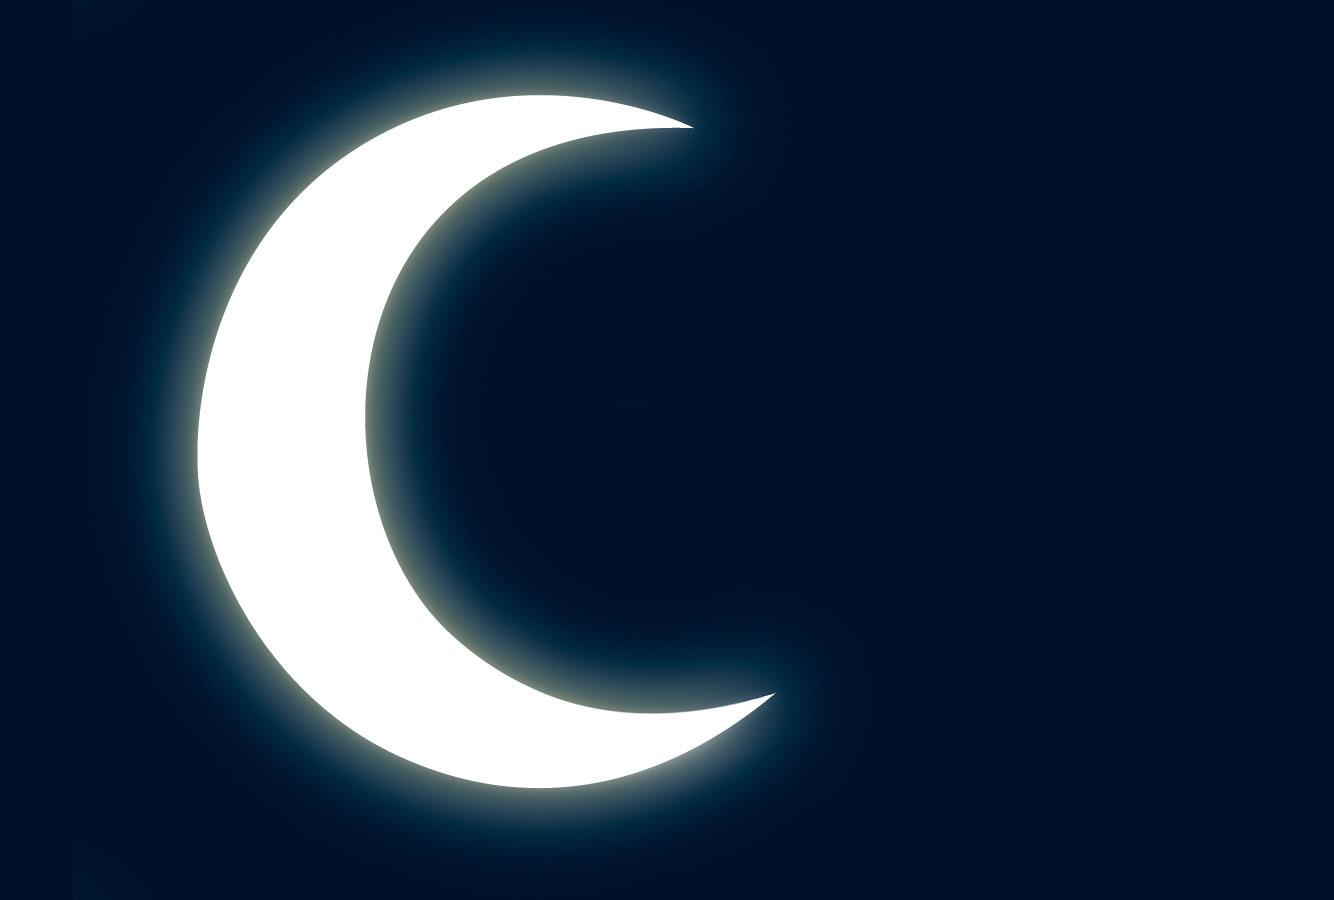 Mond Solo_q80